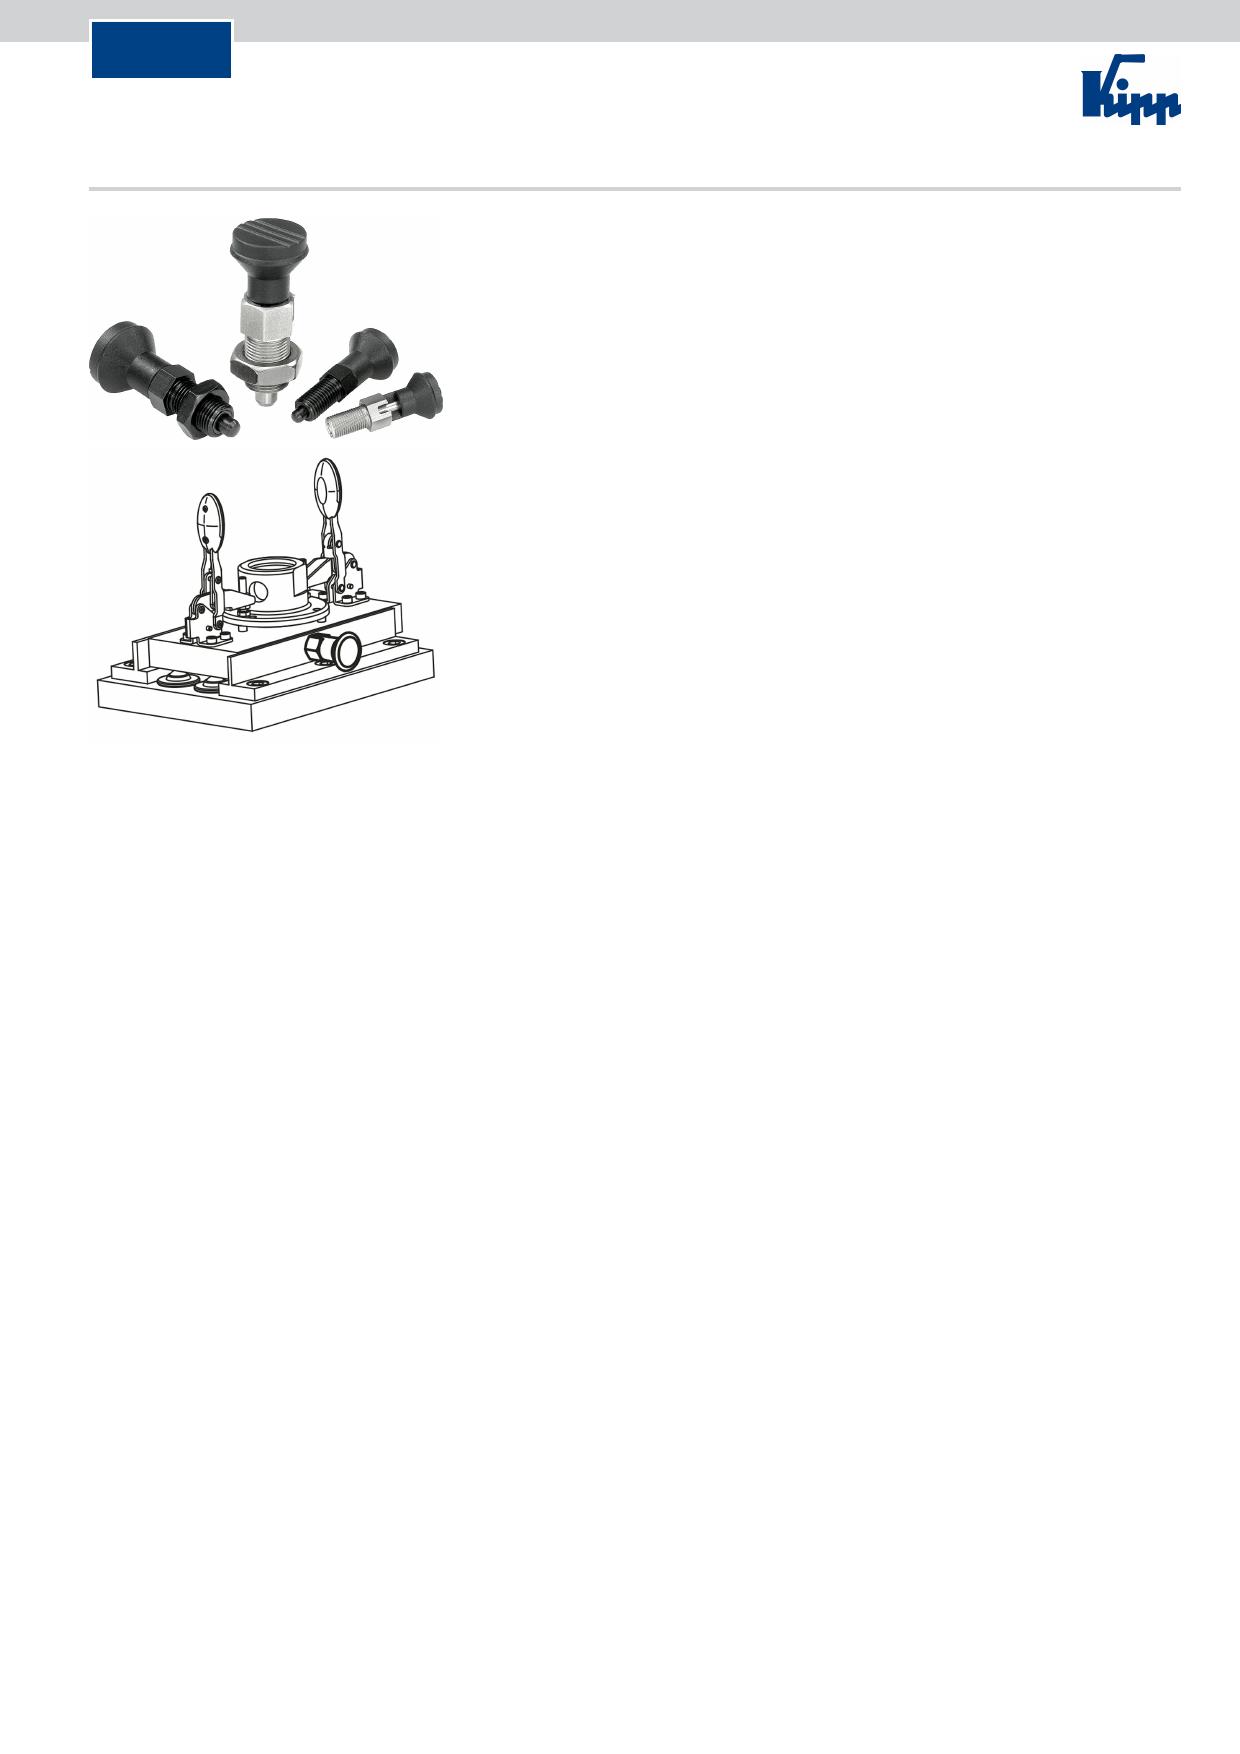 K0339 datasheet